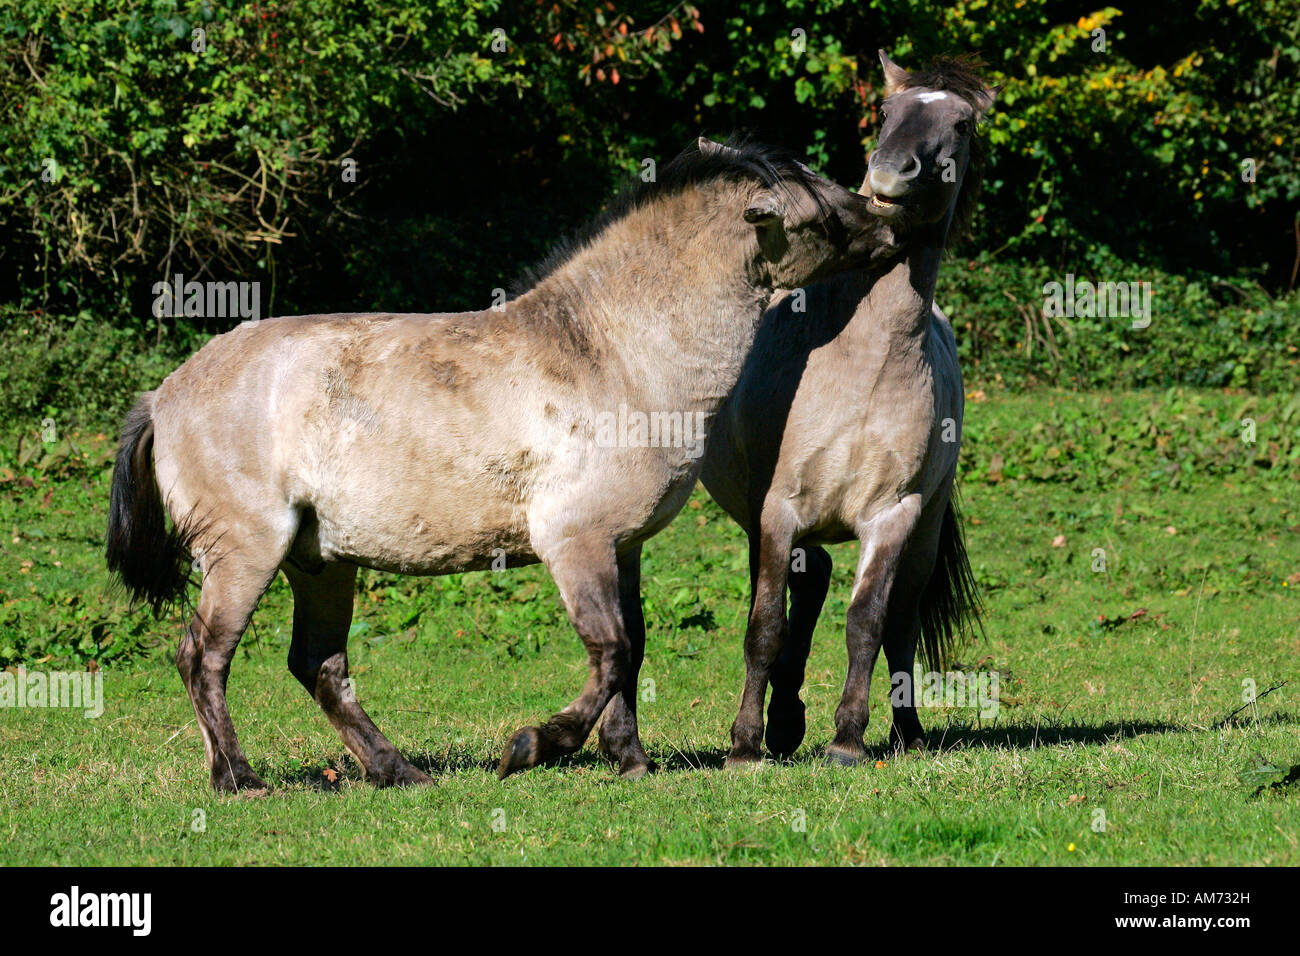 Konik horses - koniks - social behaviour (Equus przewalskii f. caballus) Stock Photo